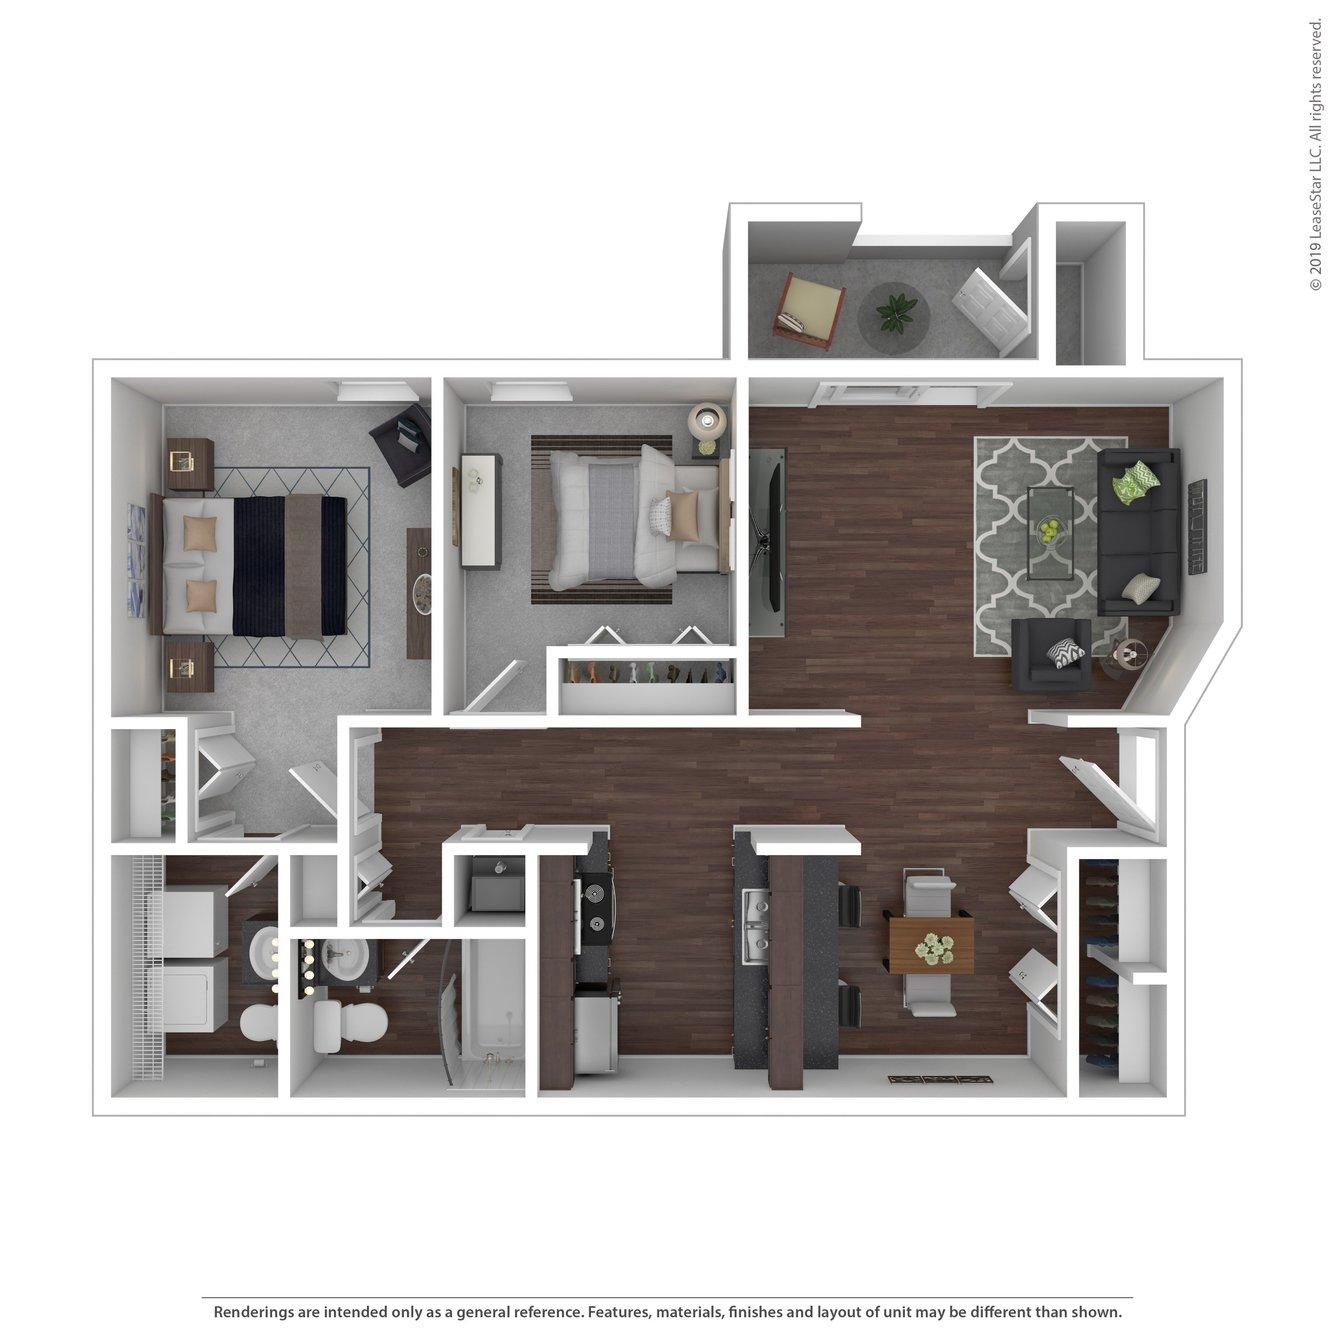 Southside Communities Apartments Rentals: Southside Indianapolis Apartments